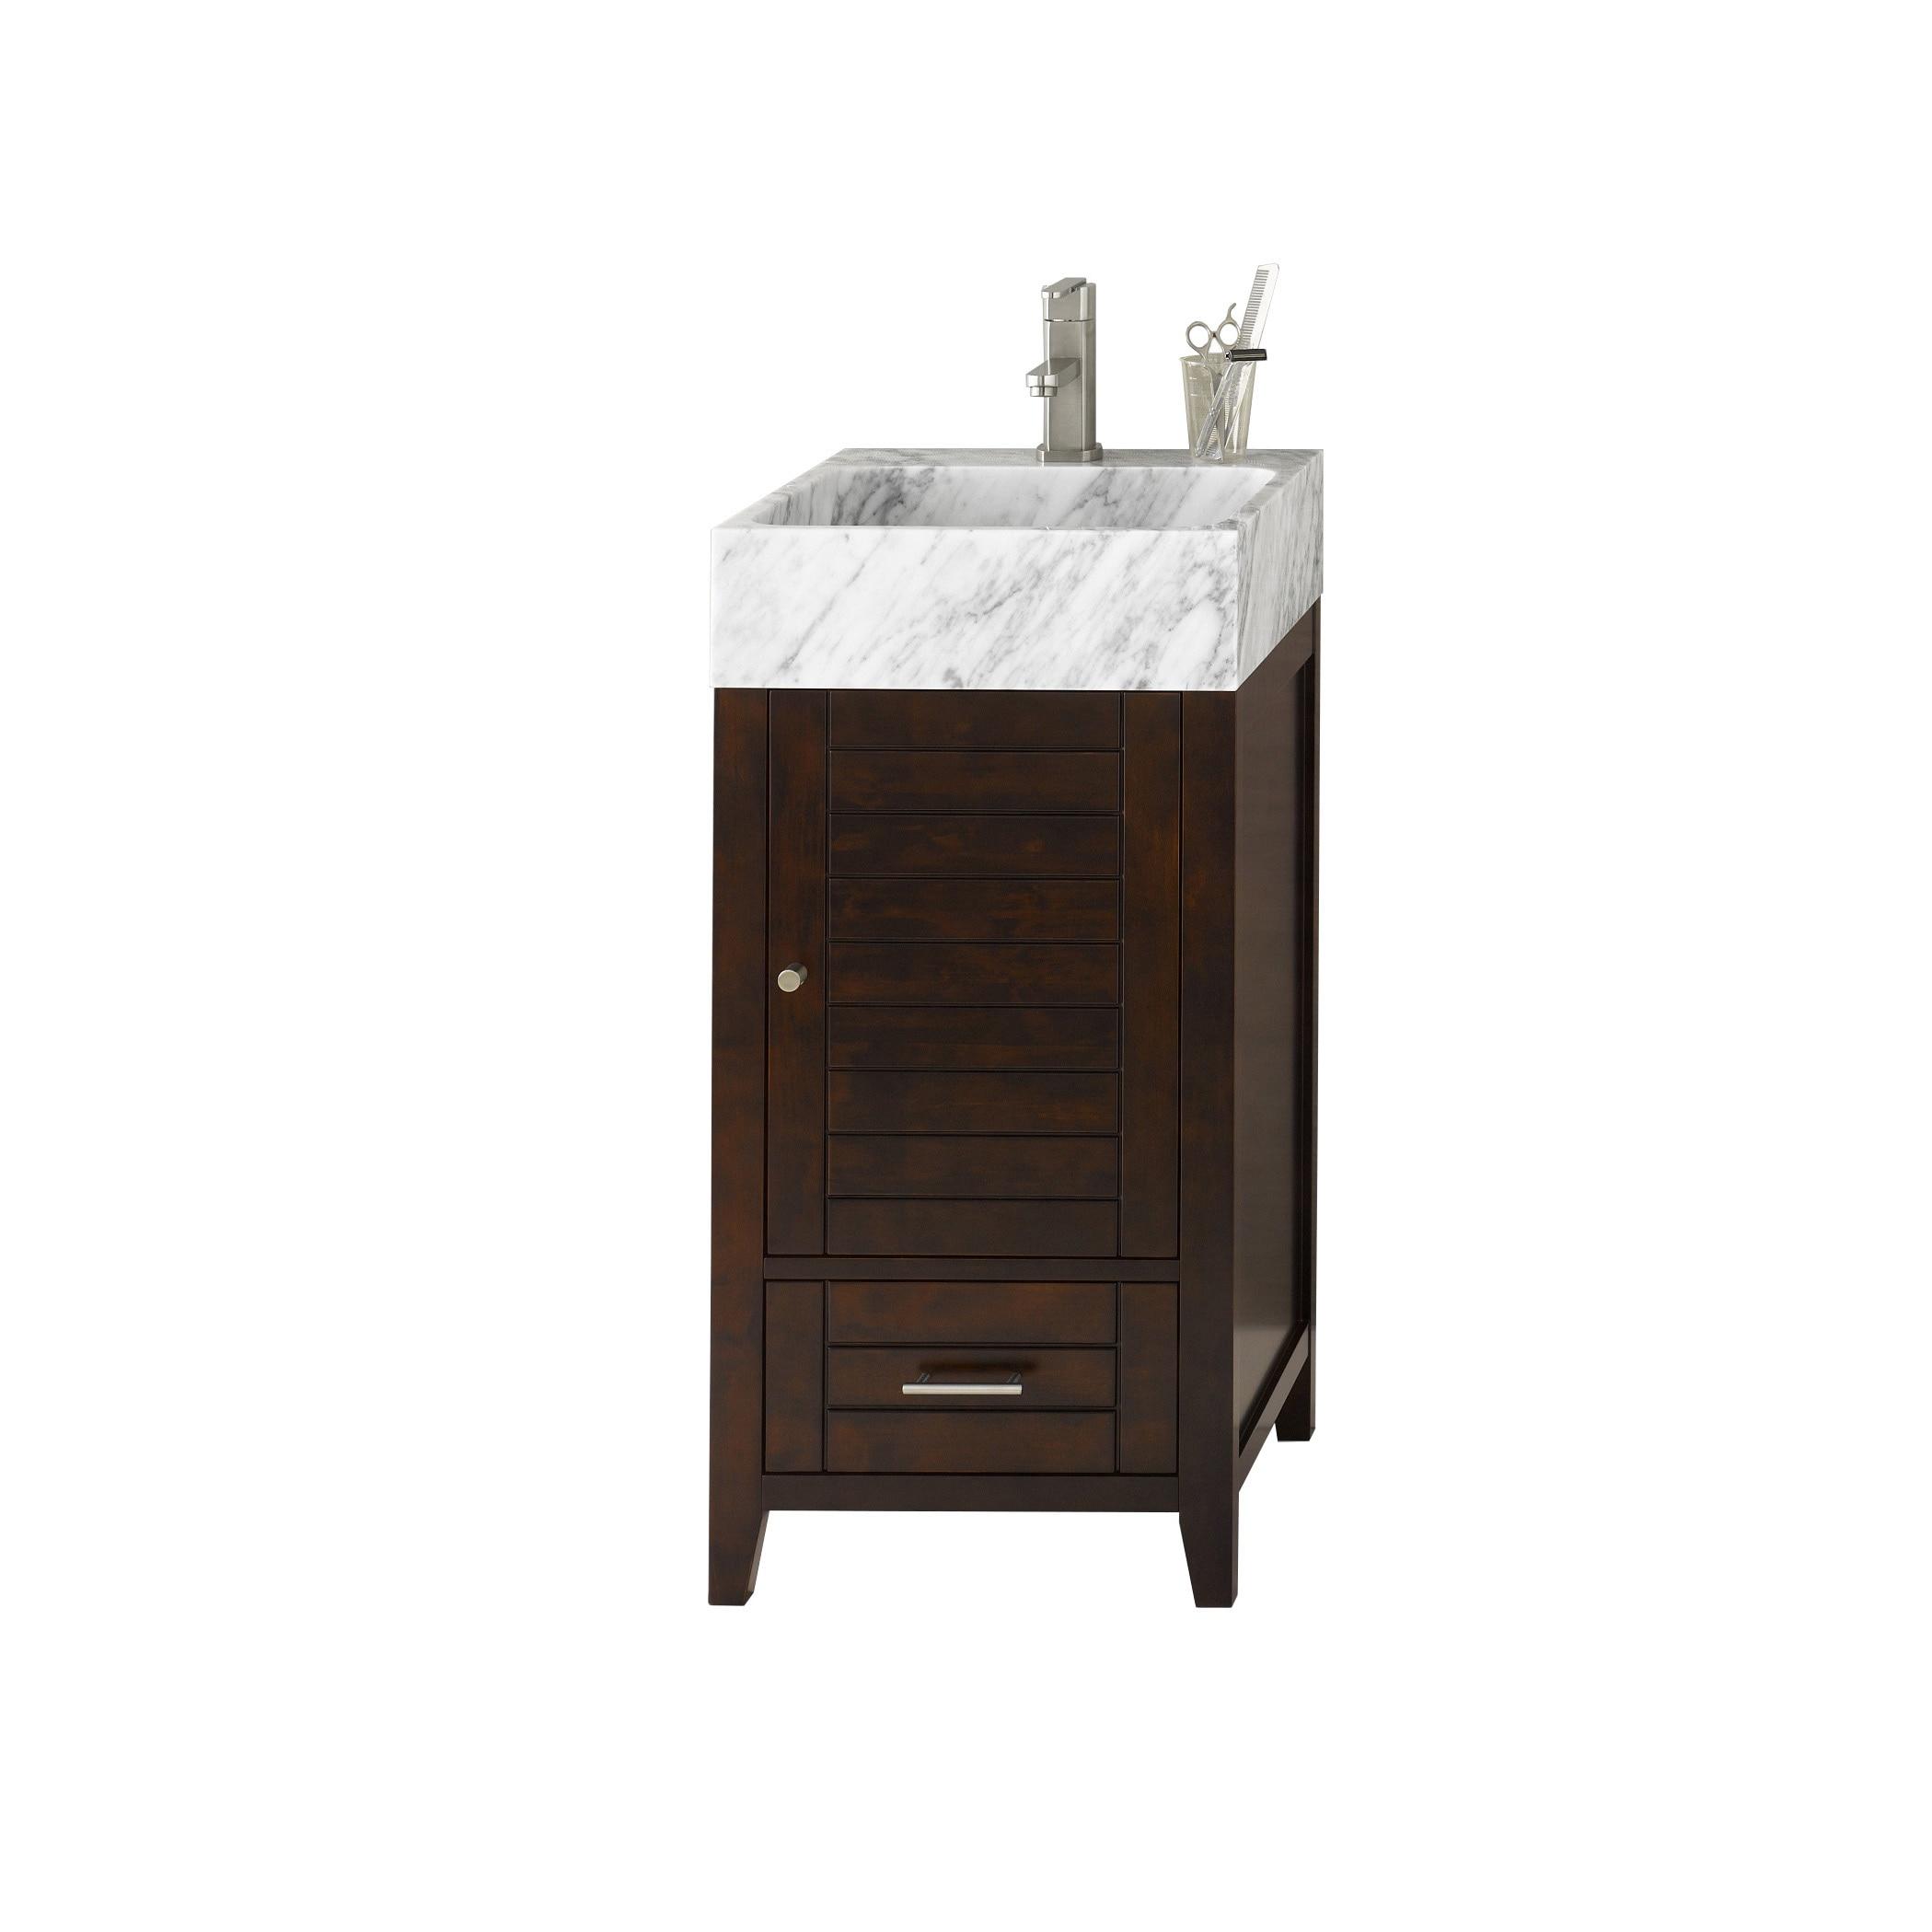 Shop Ronbow Elise Vintage Walnut 18 Inch Bathroom Vanity Set With